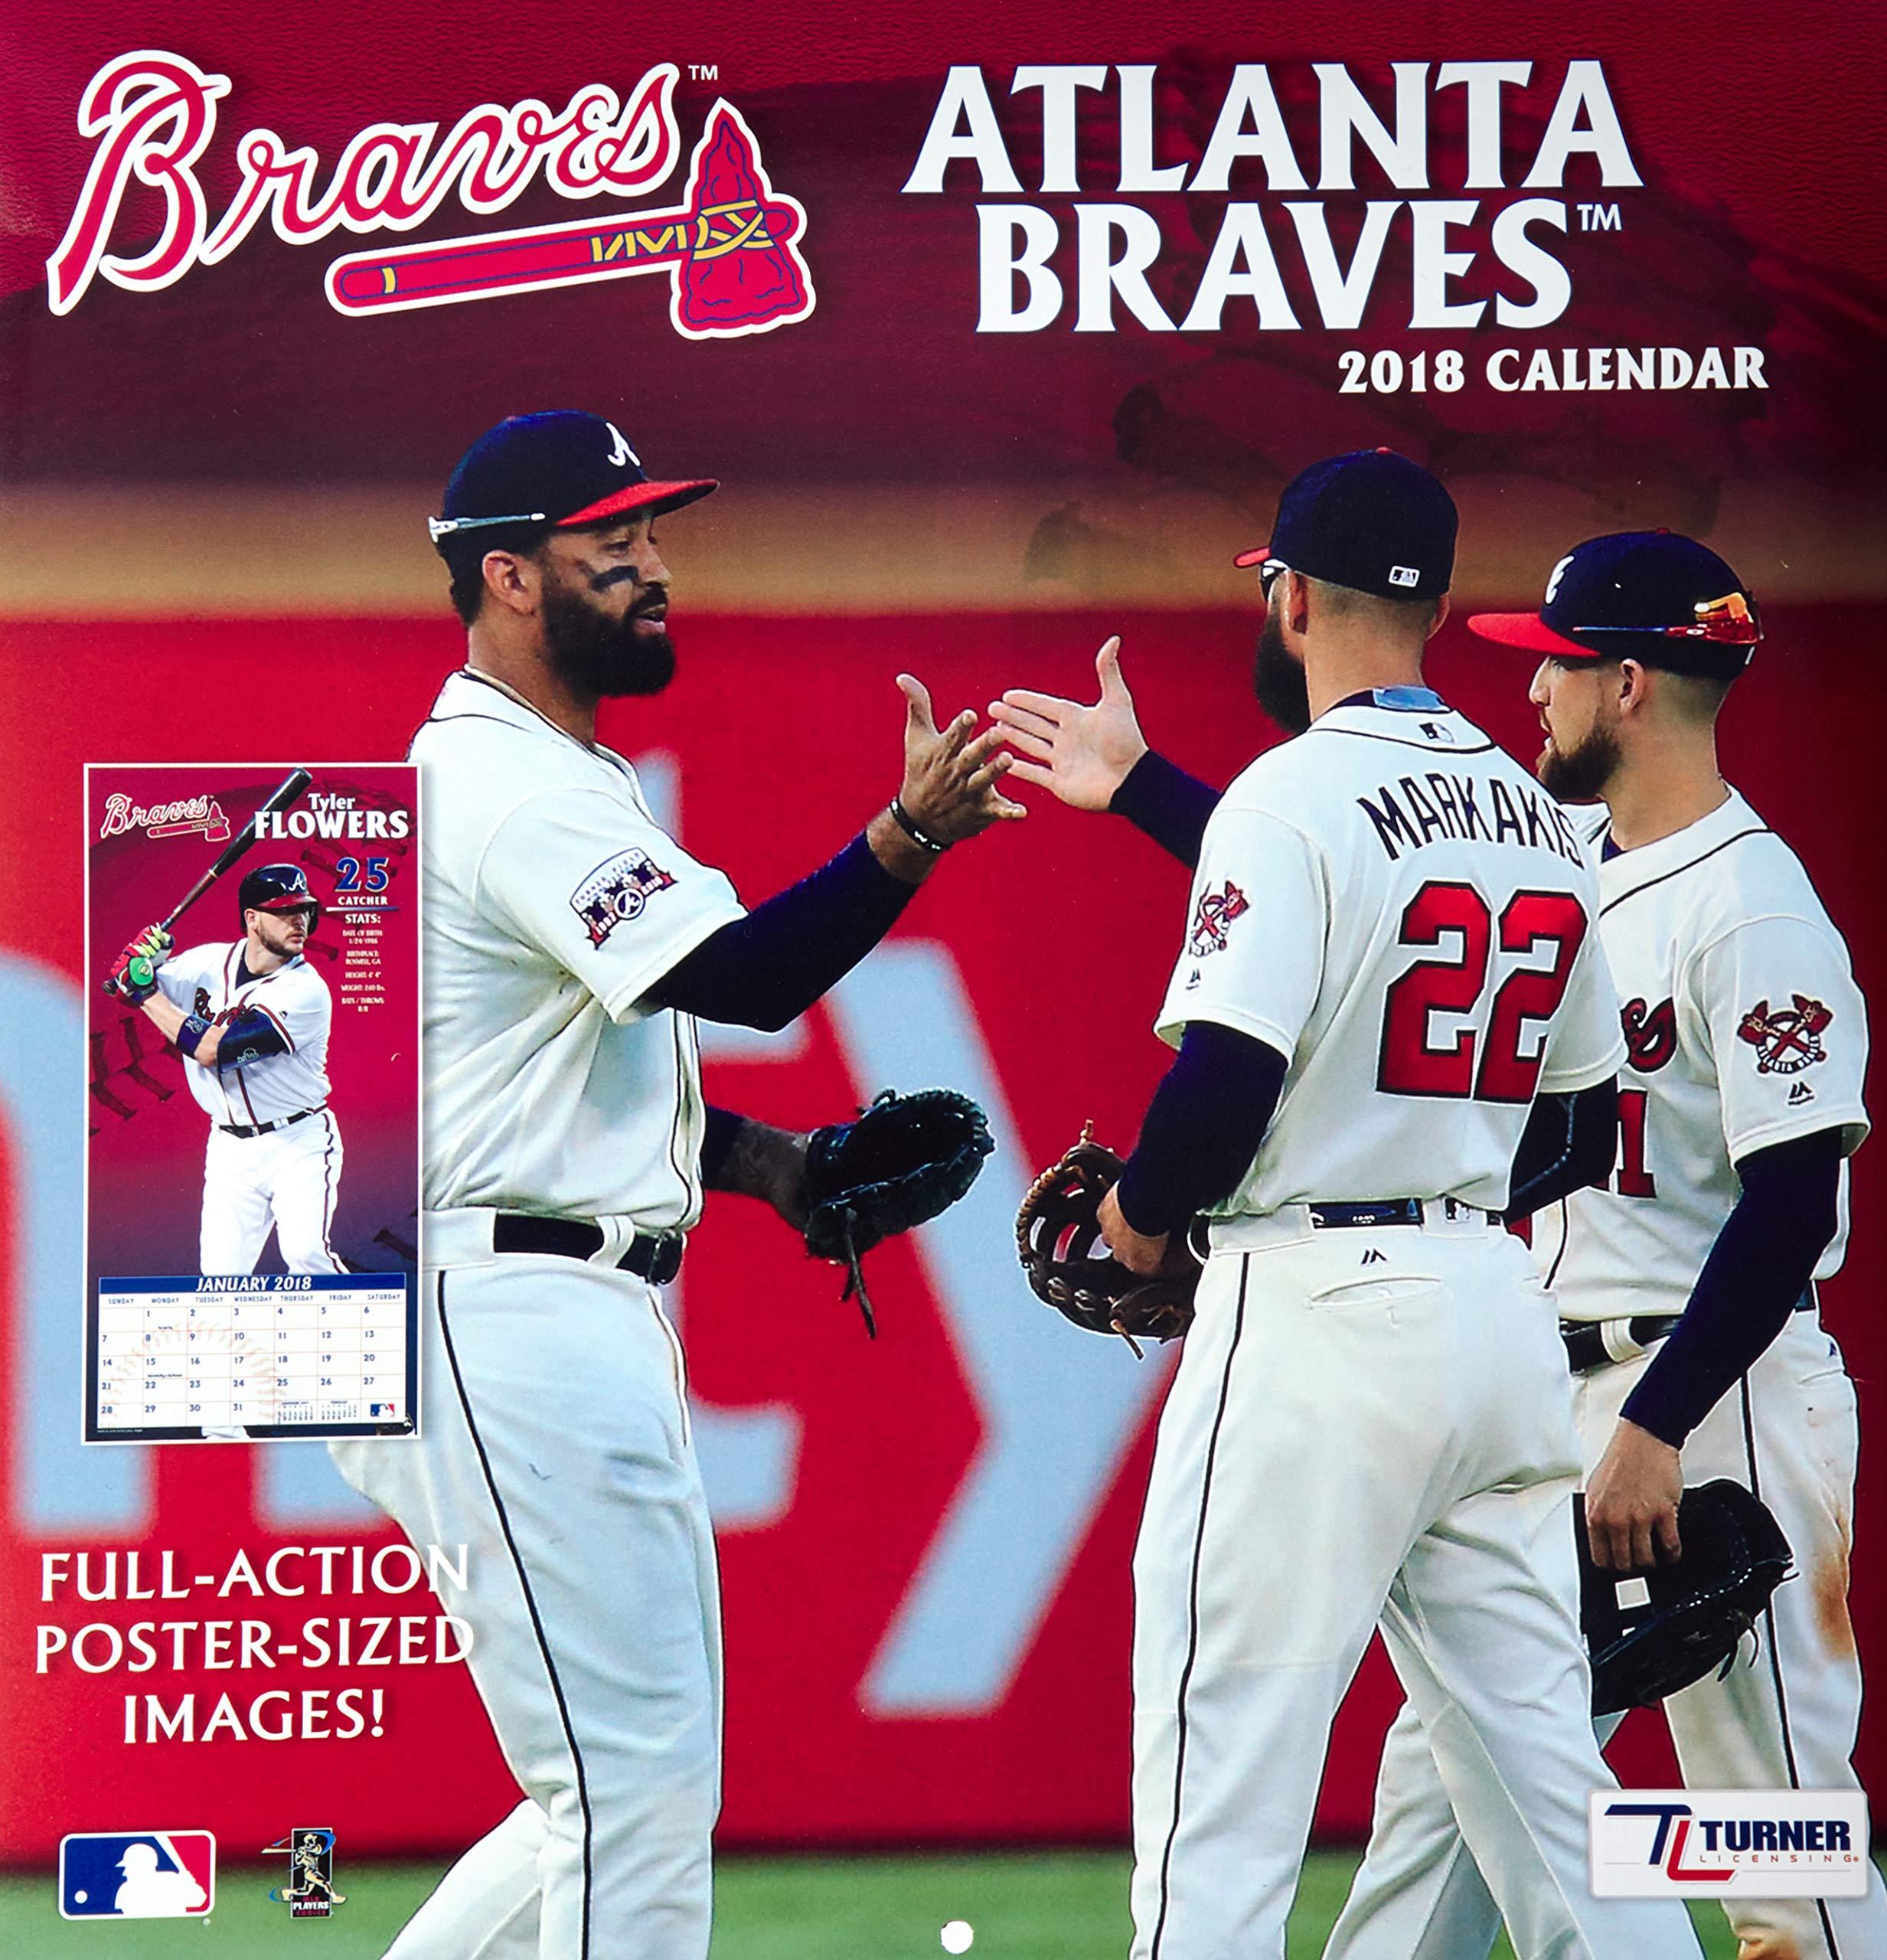 new product 9cd74 0b207 Atlanta Braves 2018 Calendar: Inc. Lang Companies ...